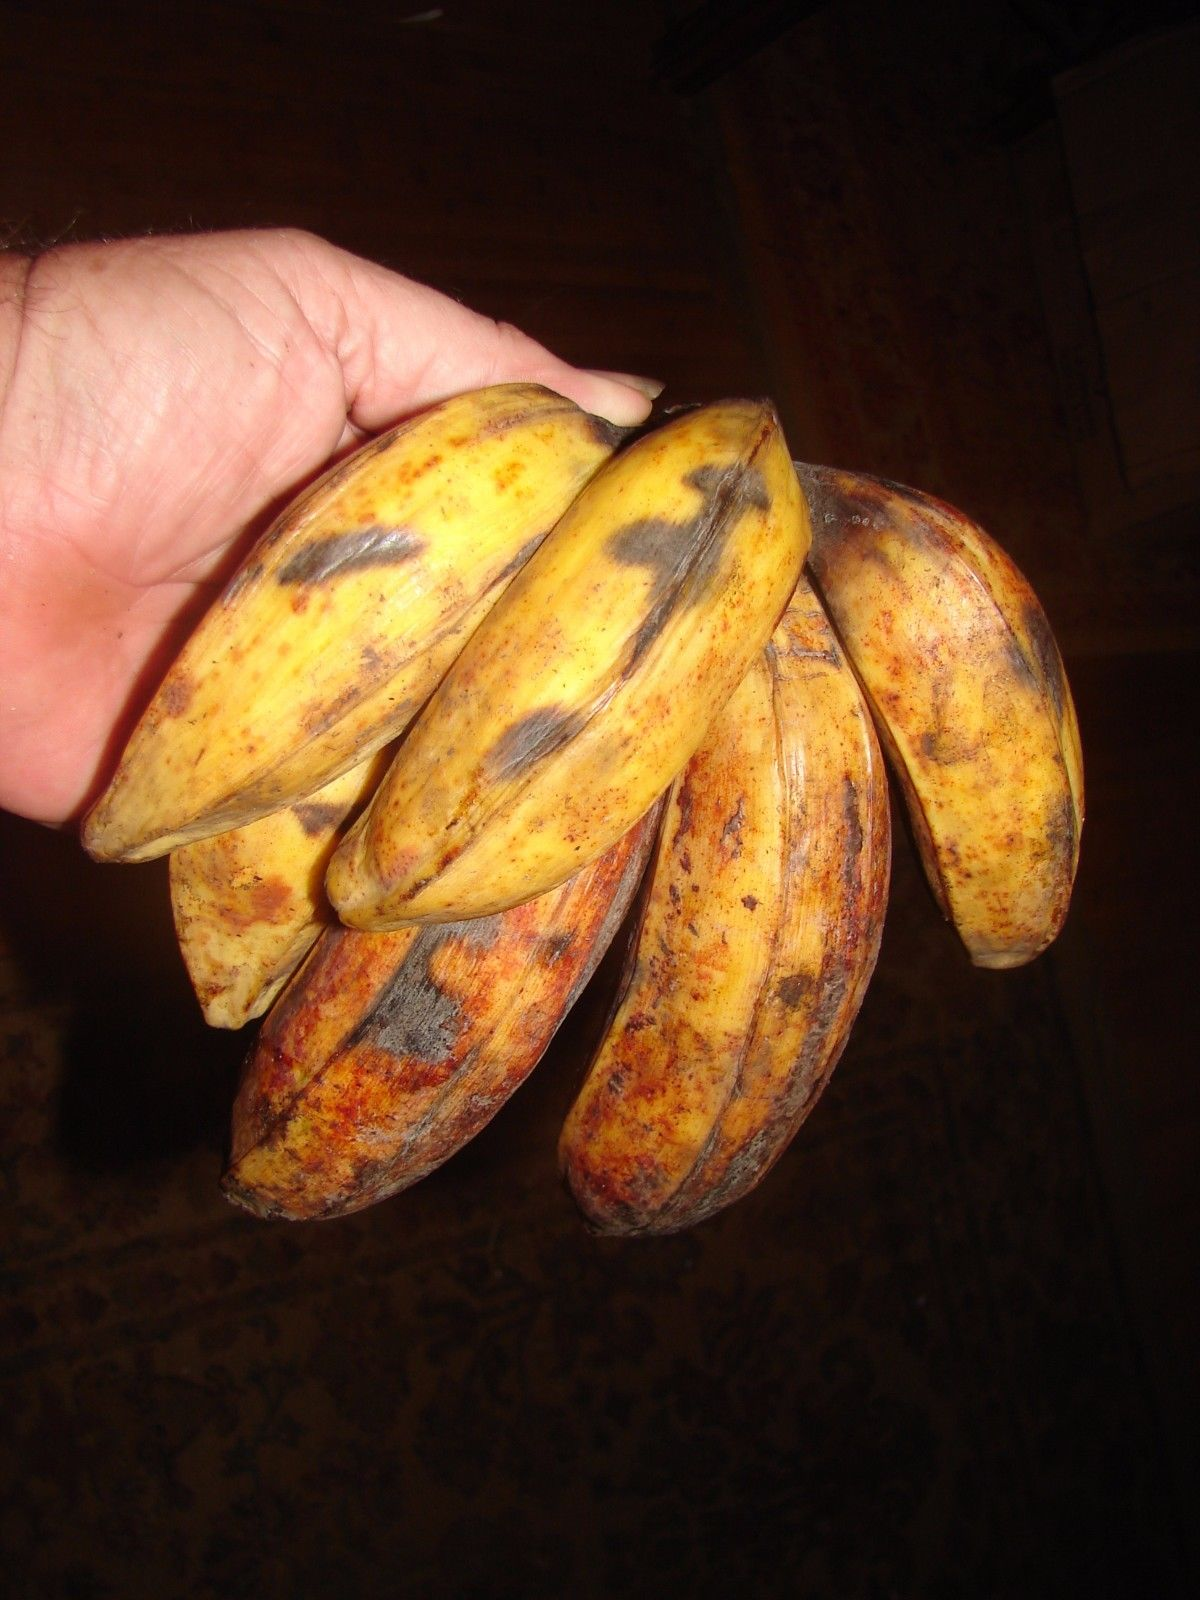 Polynesian Produce Stand : ~DWARF NAM WAH~ Musa Pisang Awak Banana Fruit Tree Live Small Potted Plant1200 x 1600 jpeg 194kB